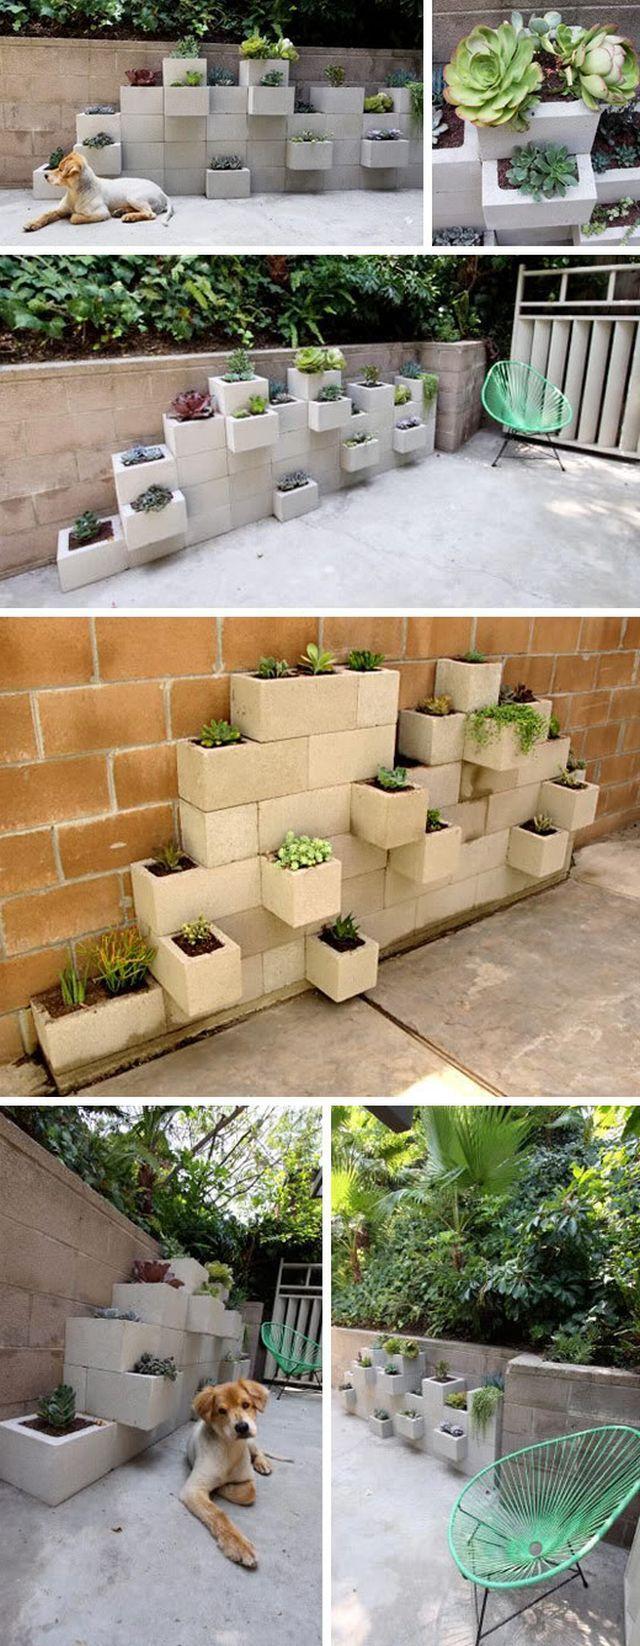 Diy Mod Cinder Block Wall Planters Jardines Decoraciones De Jardin Jardineria